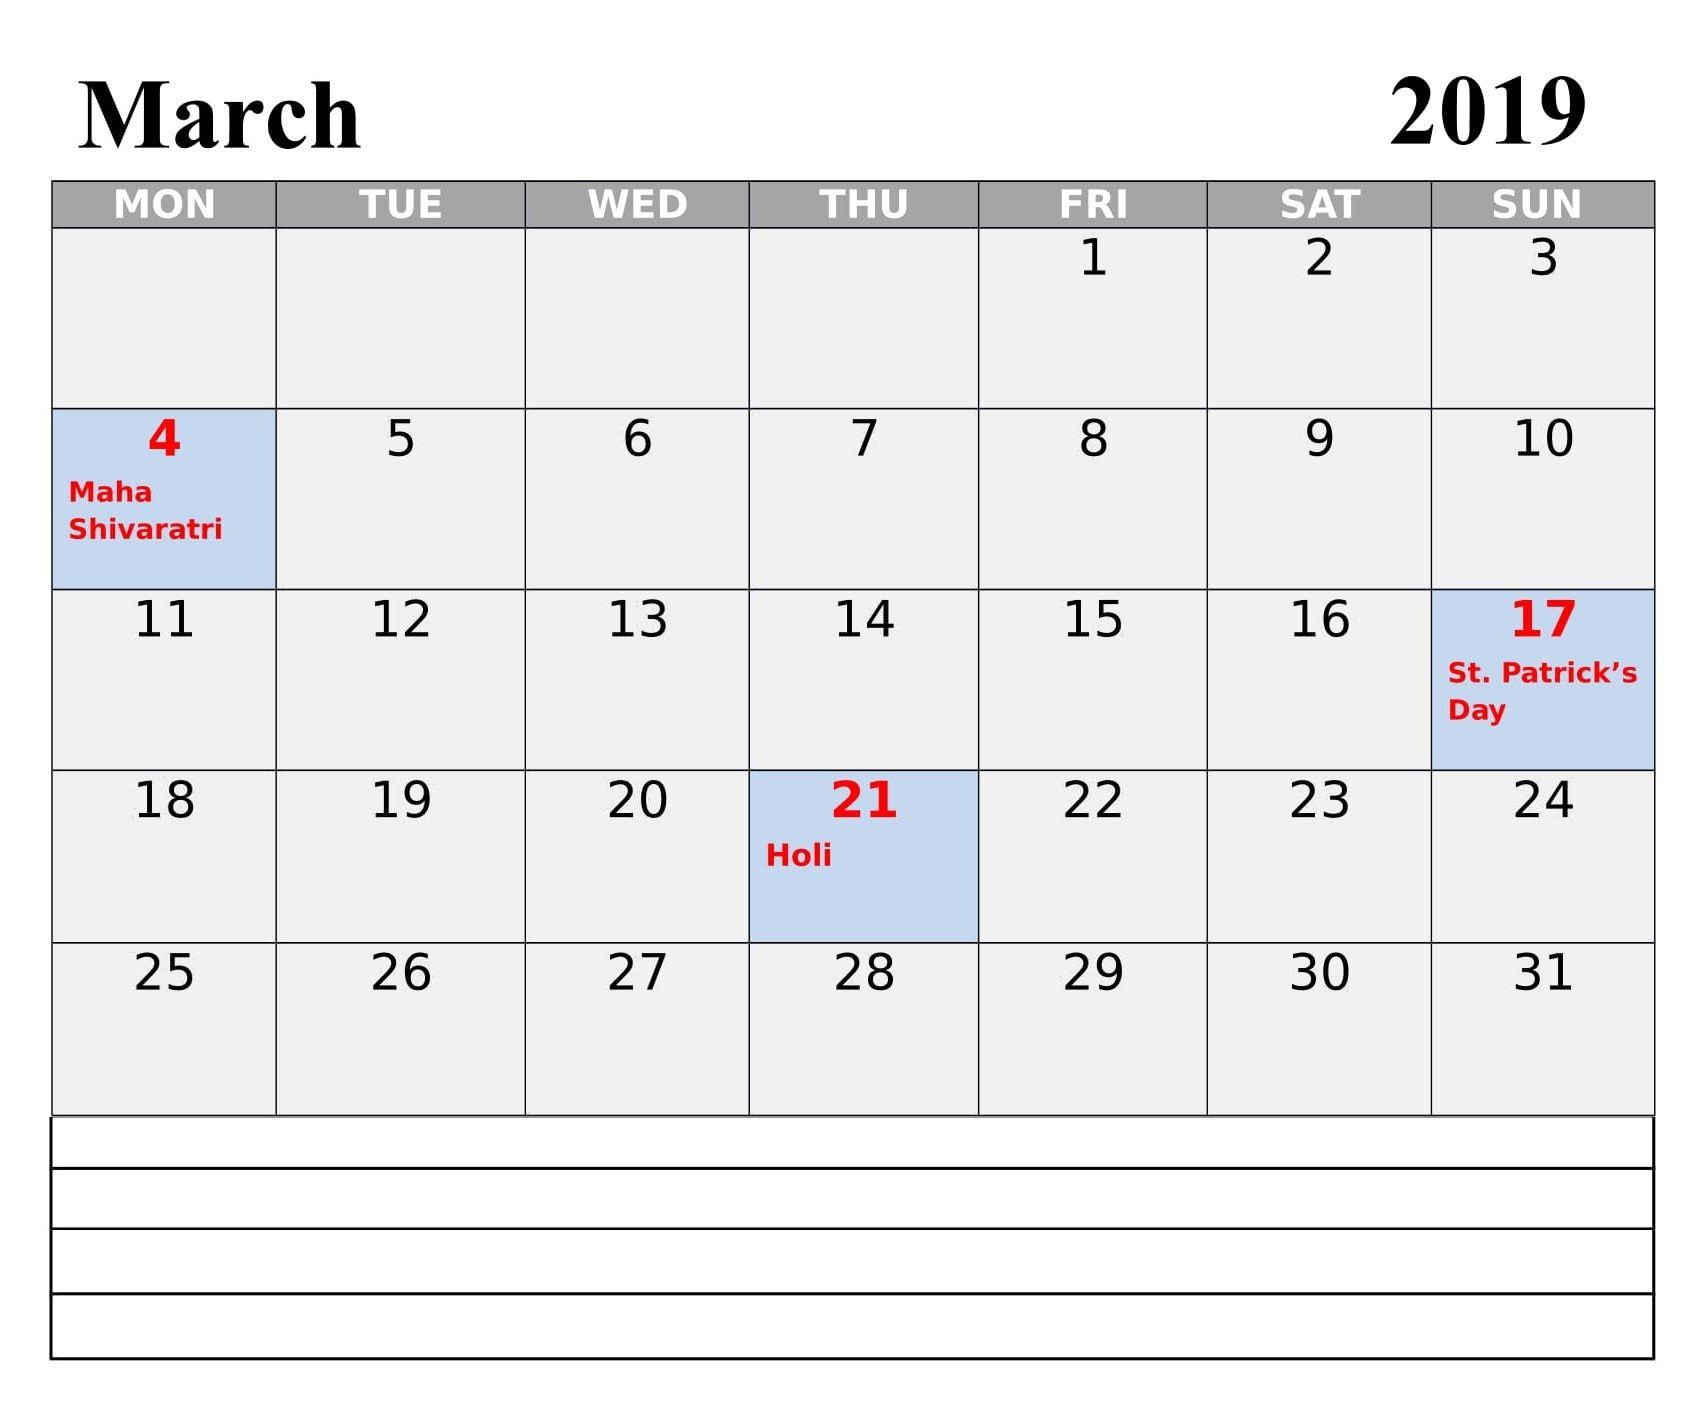 March 2019 Calendar With Holidays Usa And Canada 2019 Calendar